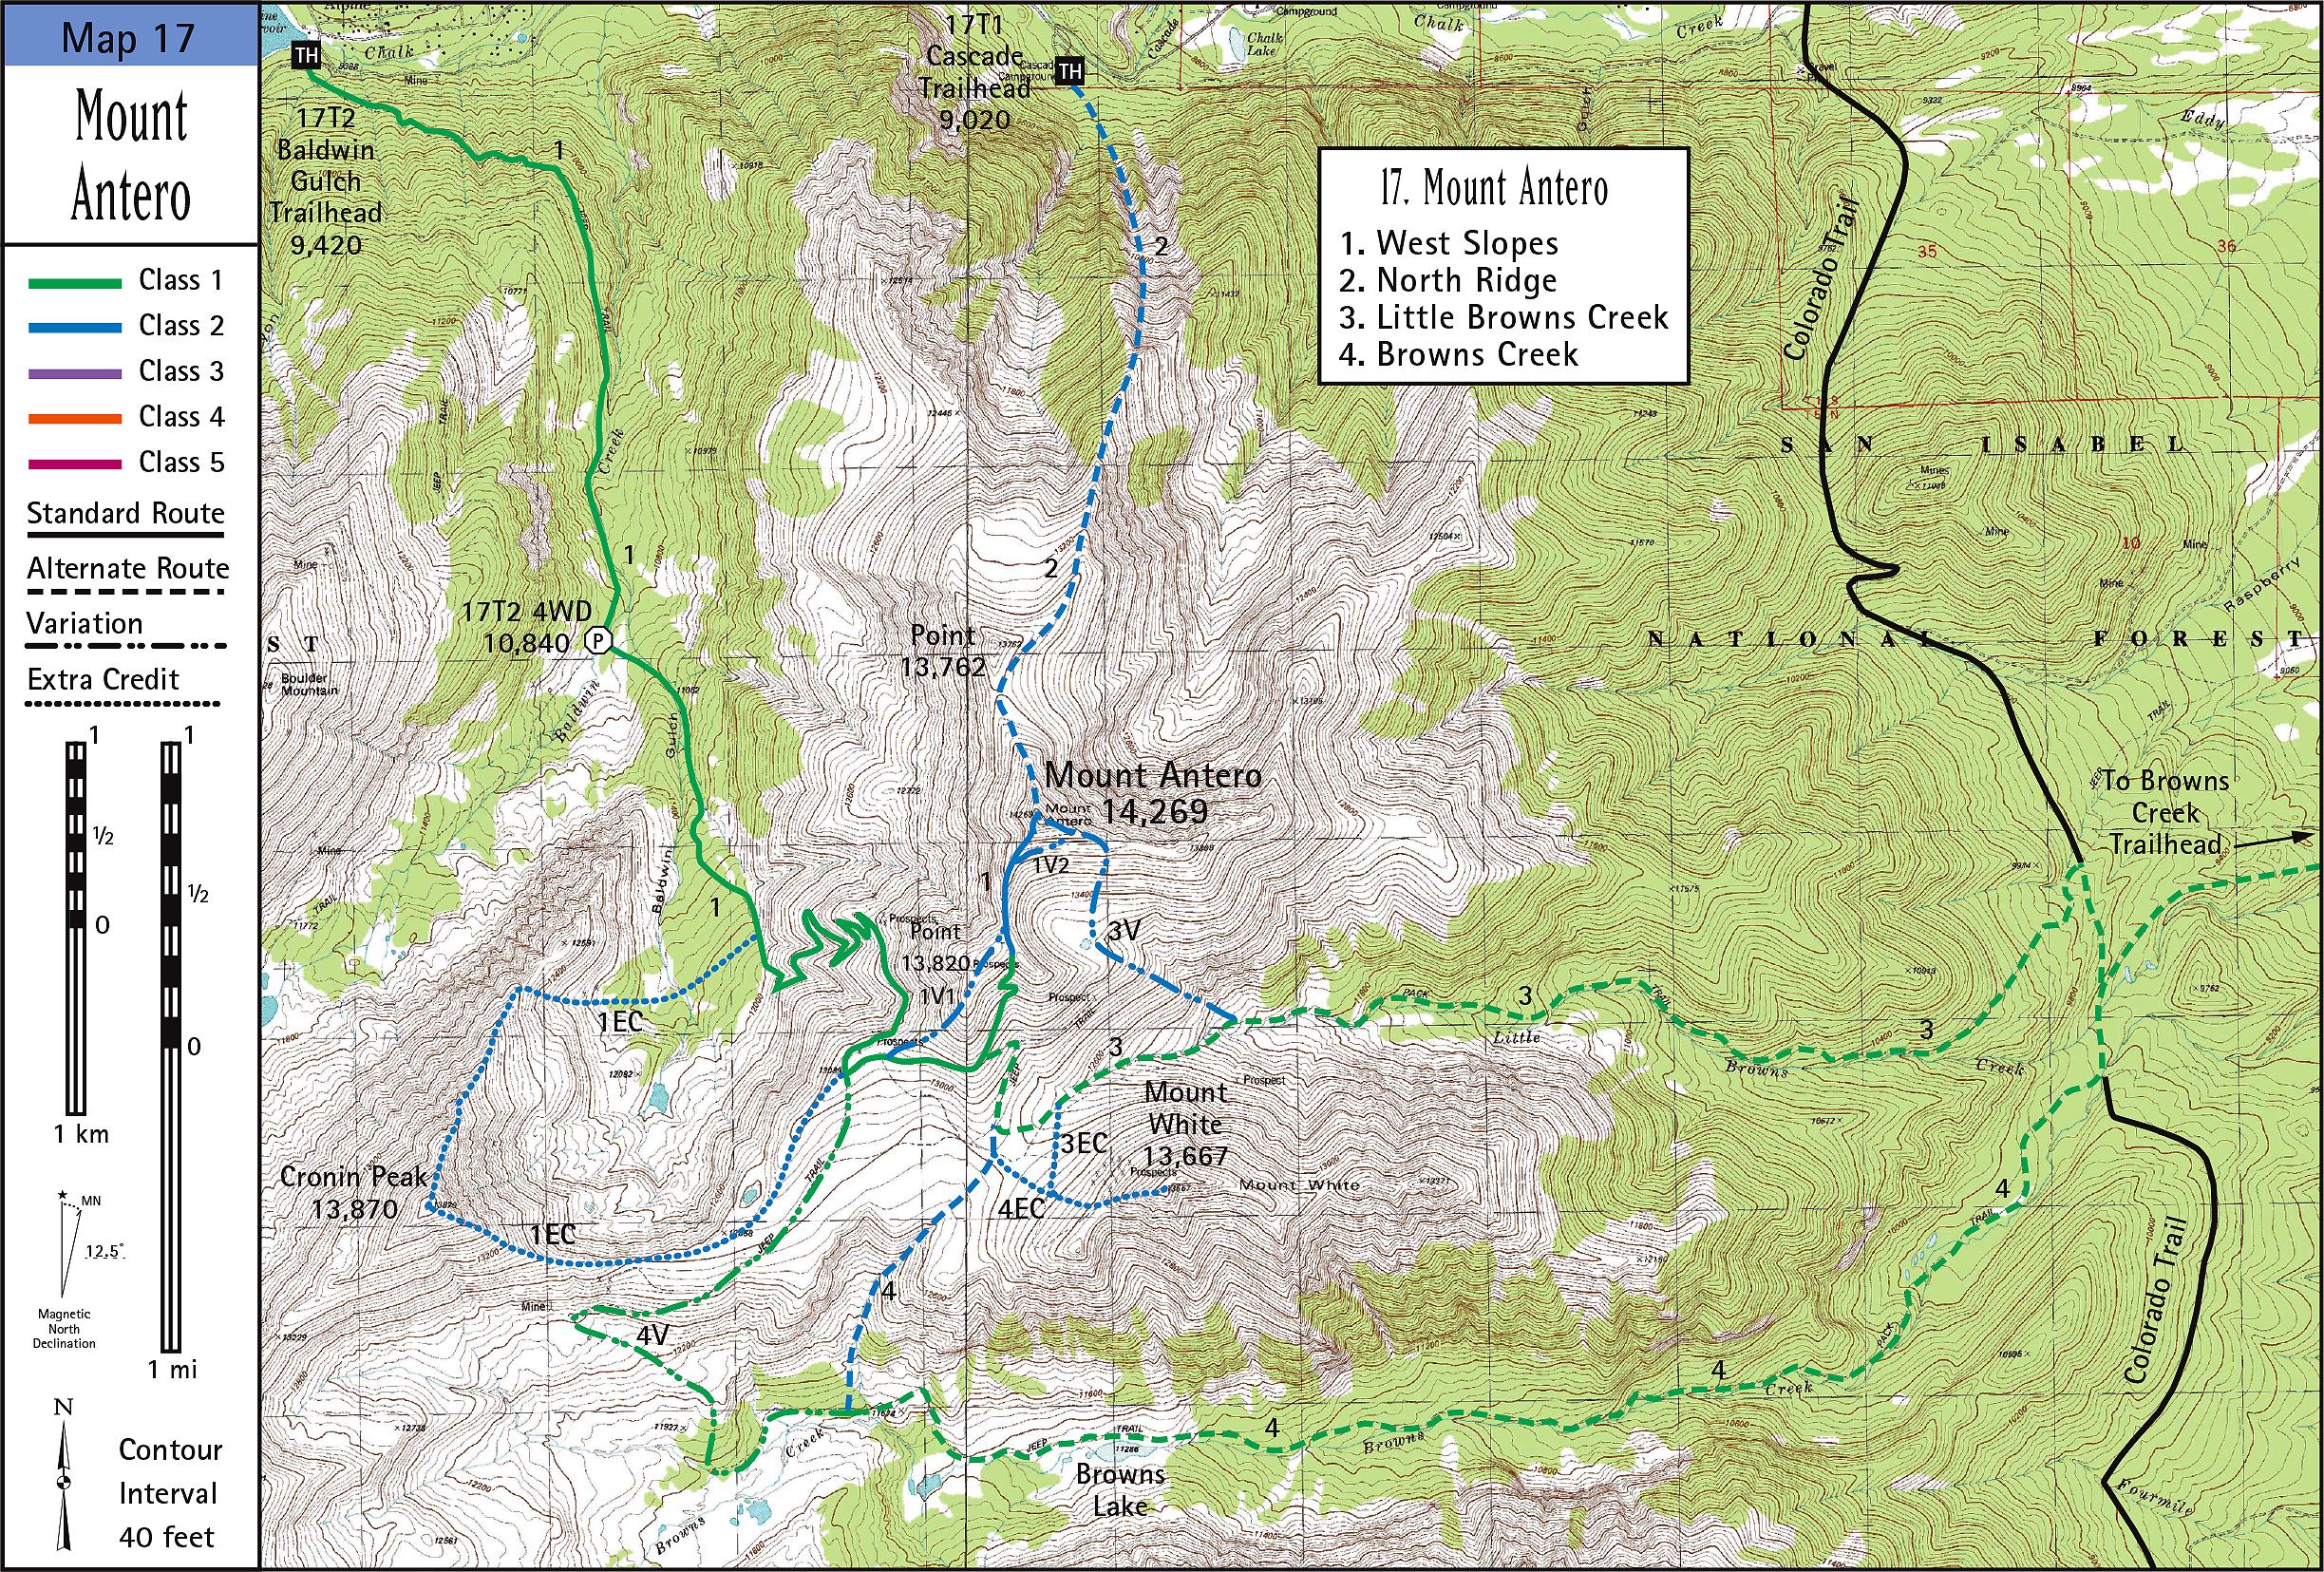 Mount Antero Map